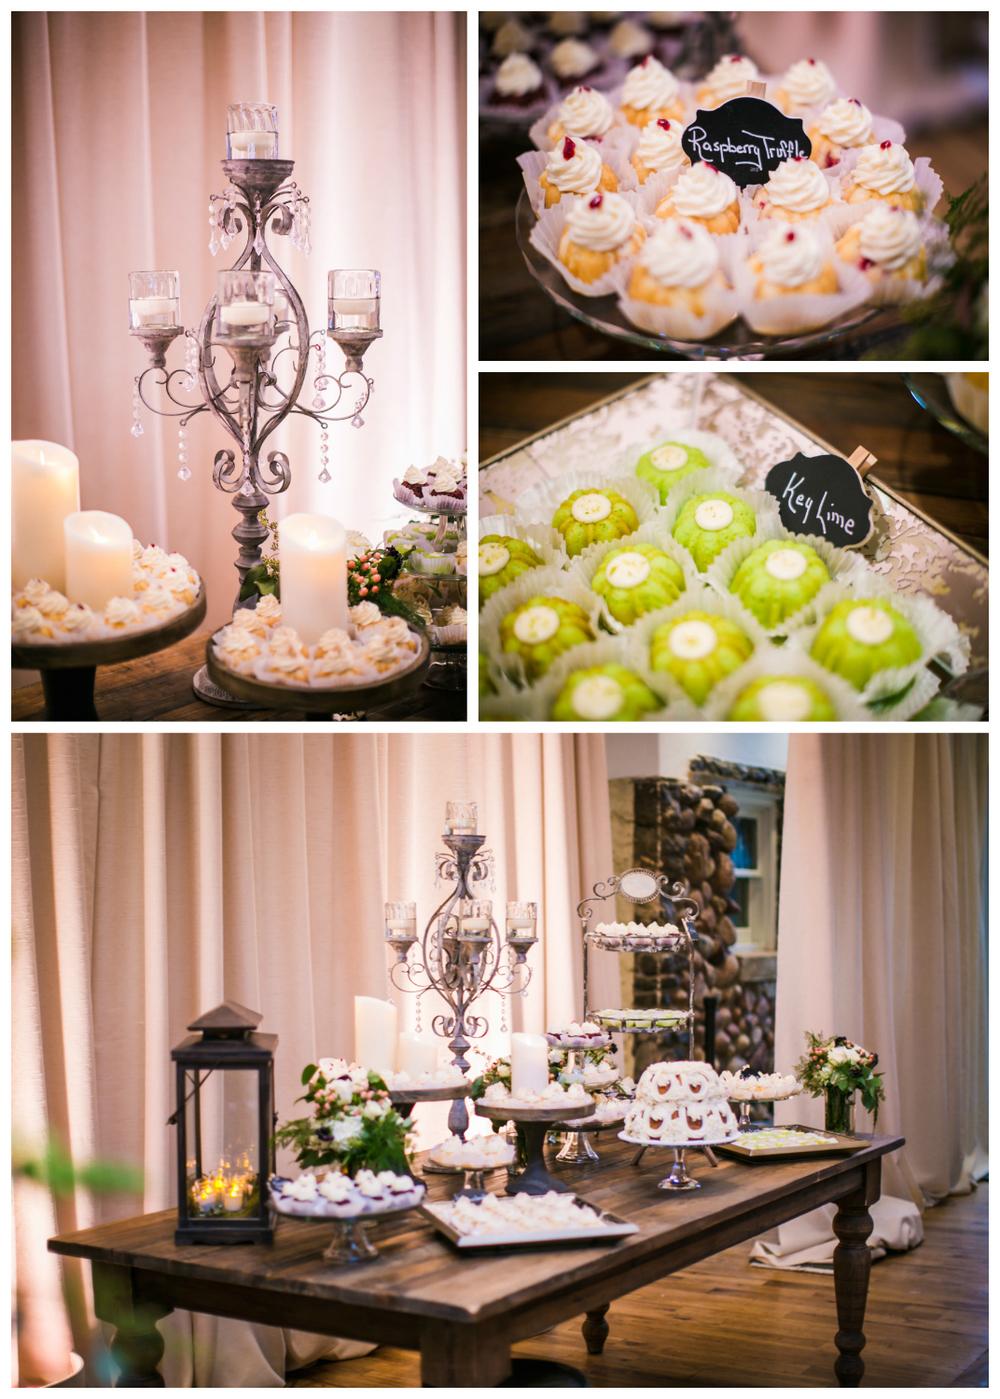 Wedding details by design works at Highlands Ranch Mansion.  hotographed by JMGant Photography, Denver Colorado wedding photographer.